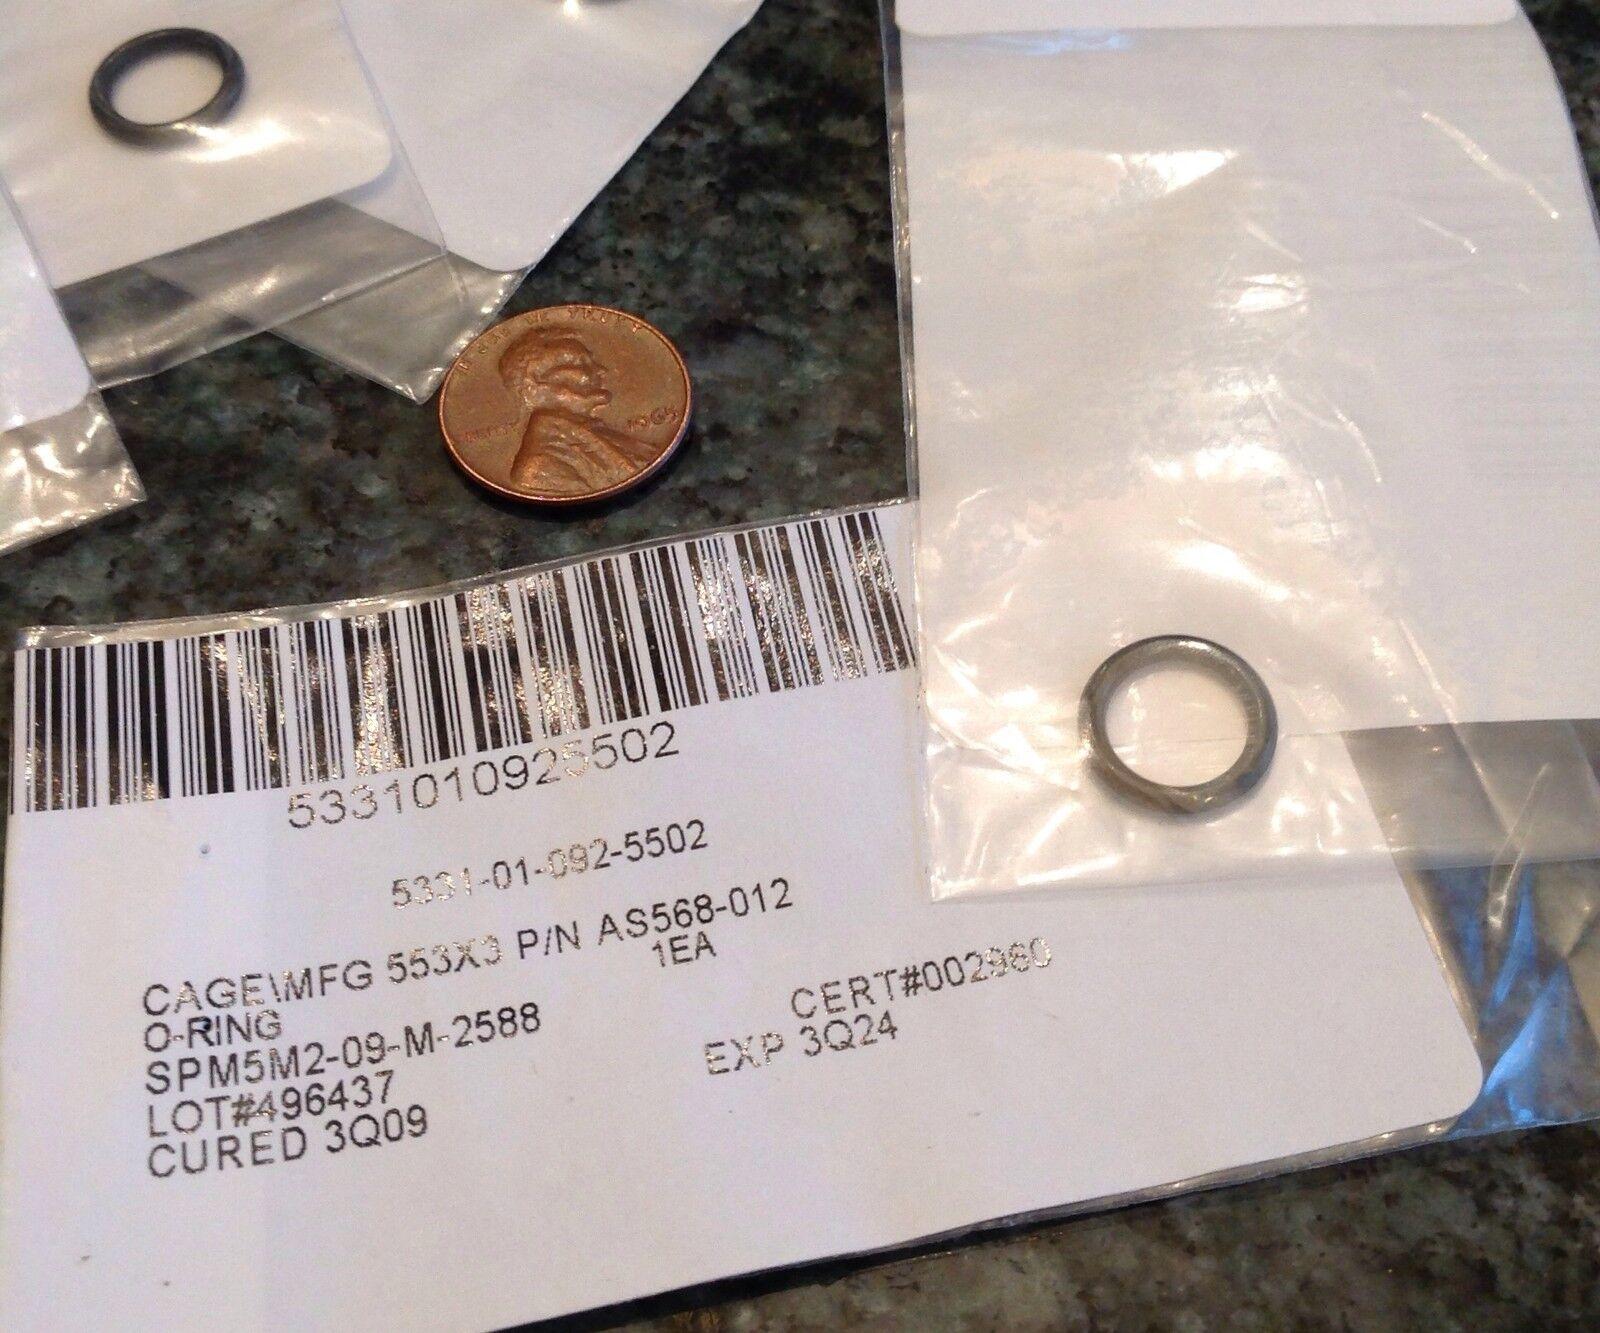 5 o rings rubber seal osh kosh 2HE922 butadiene acrylonitrile 1//2 x 3//8 x 0.039